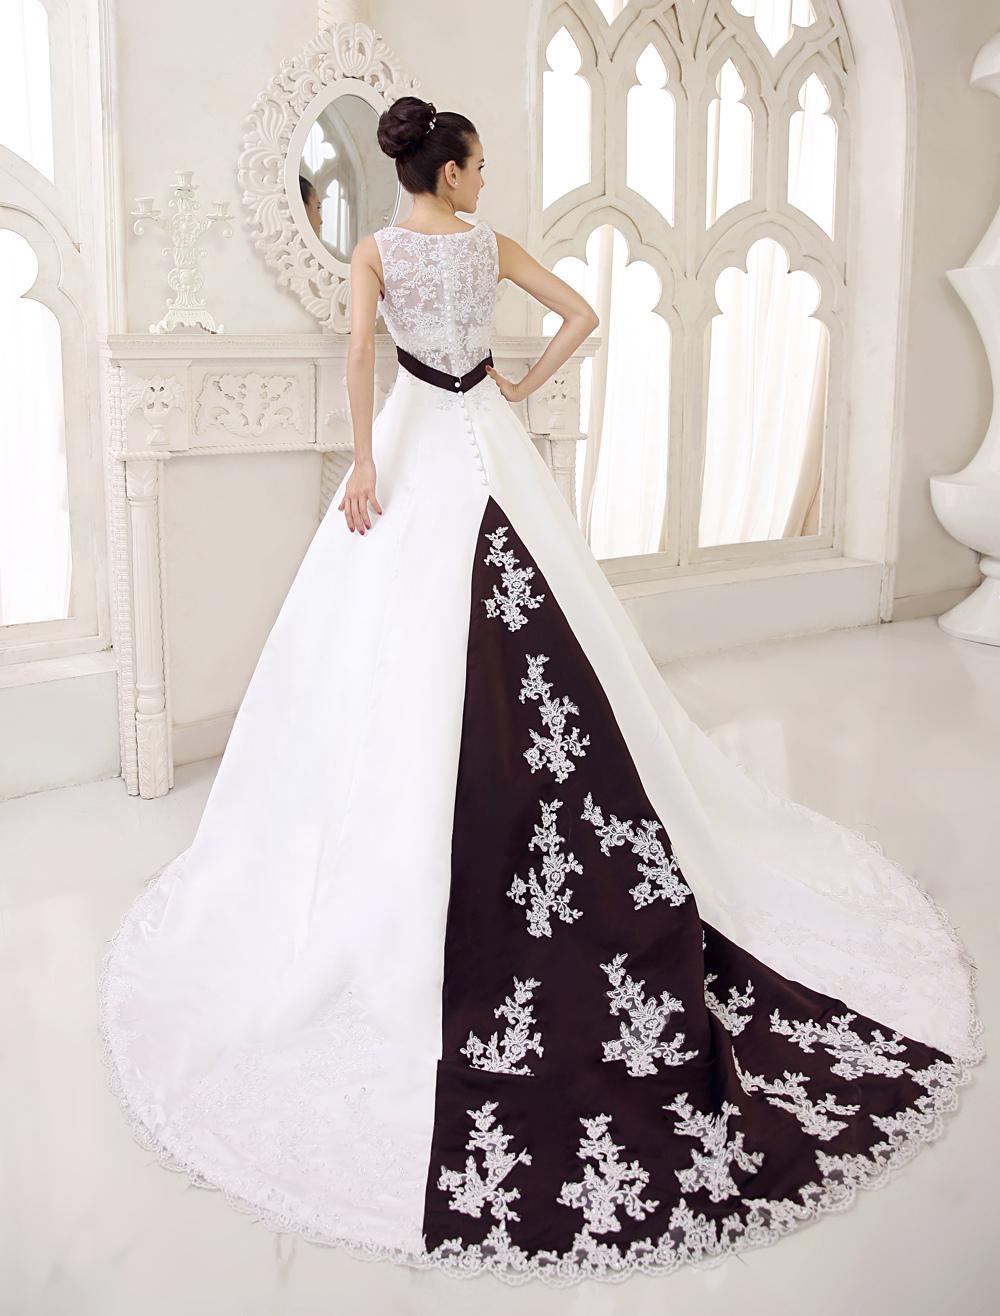 Court Train Wedding Dress For Bride with V-Neck